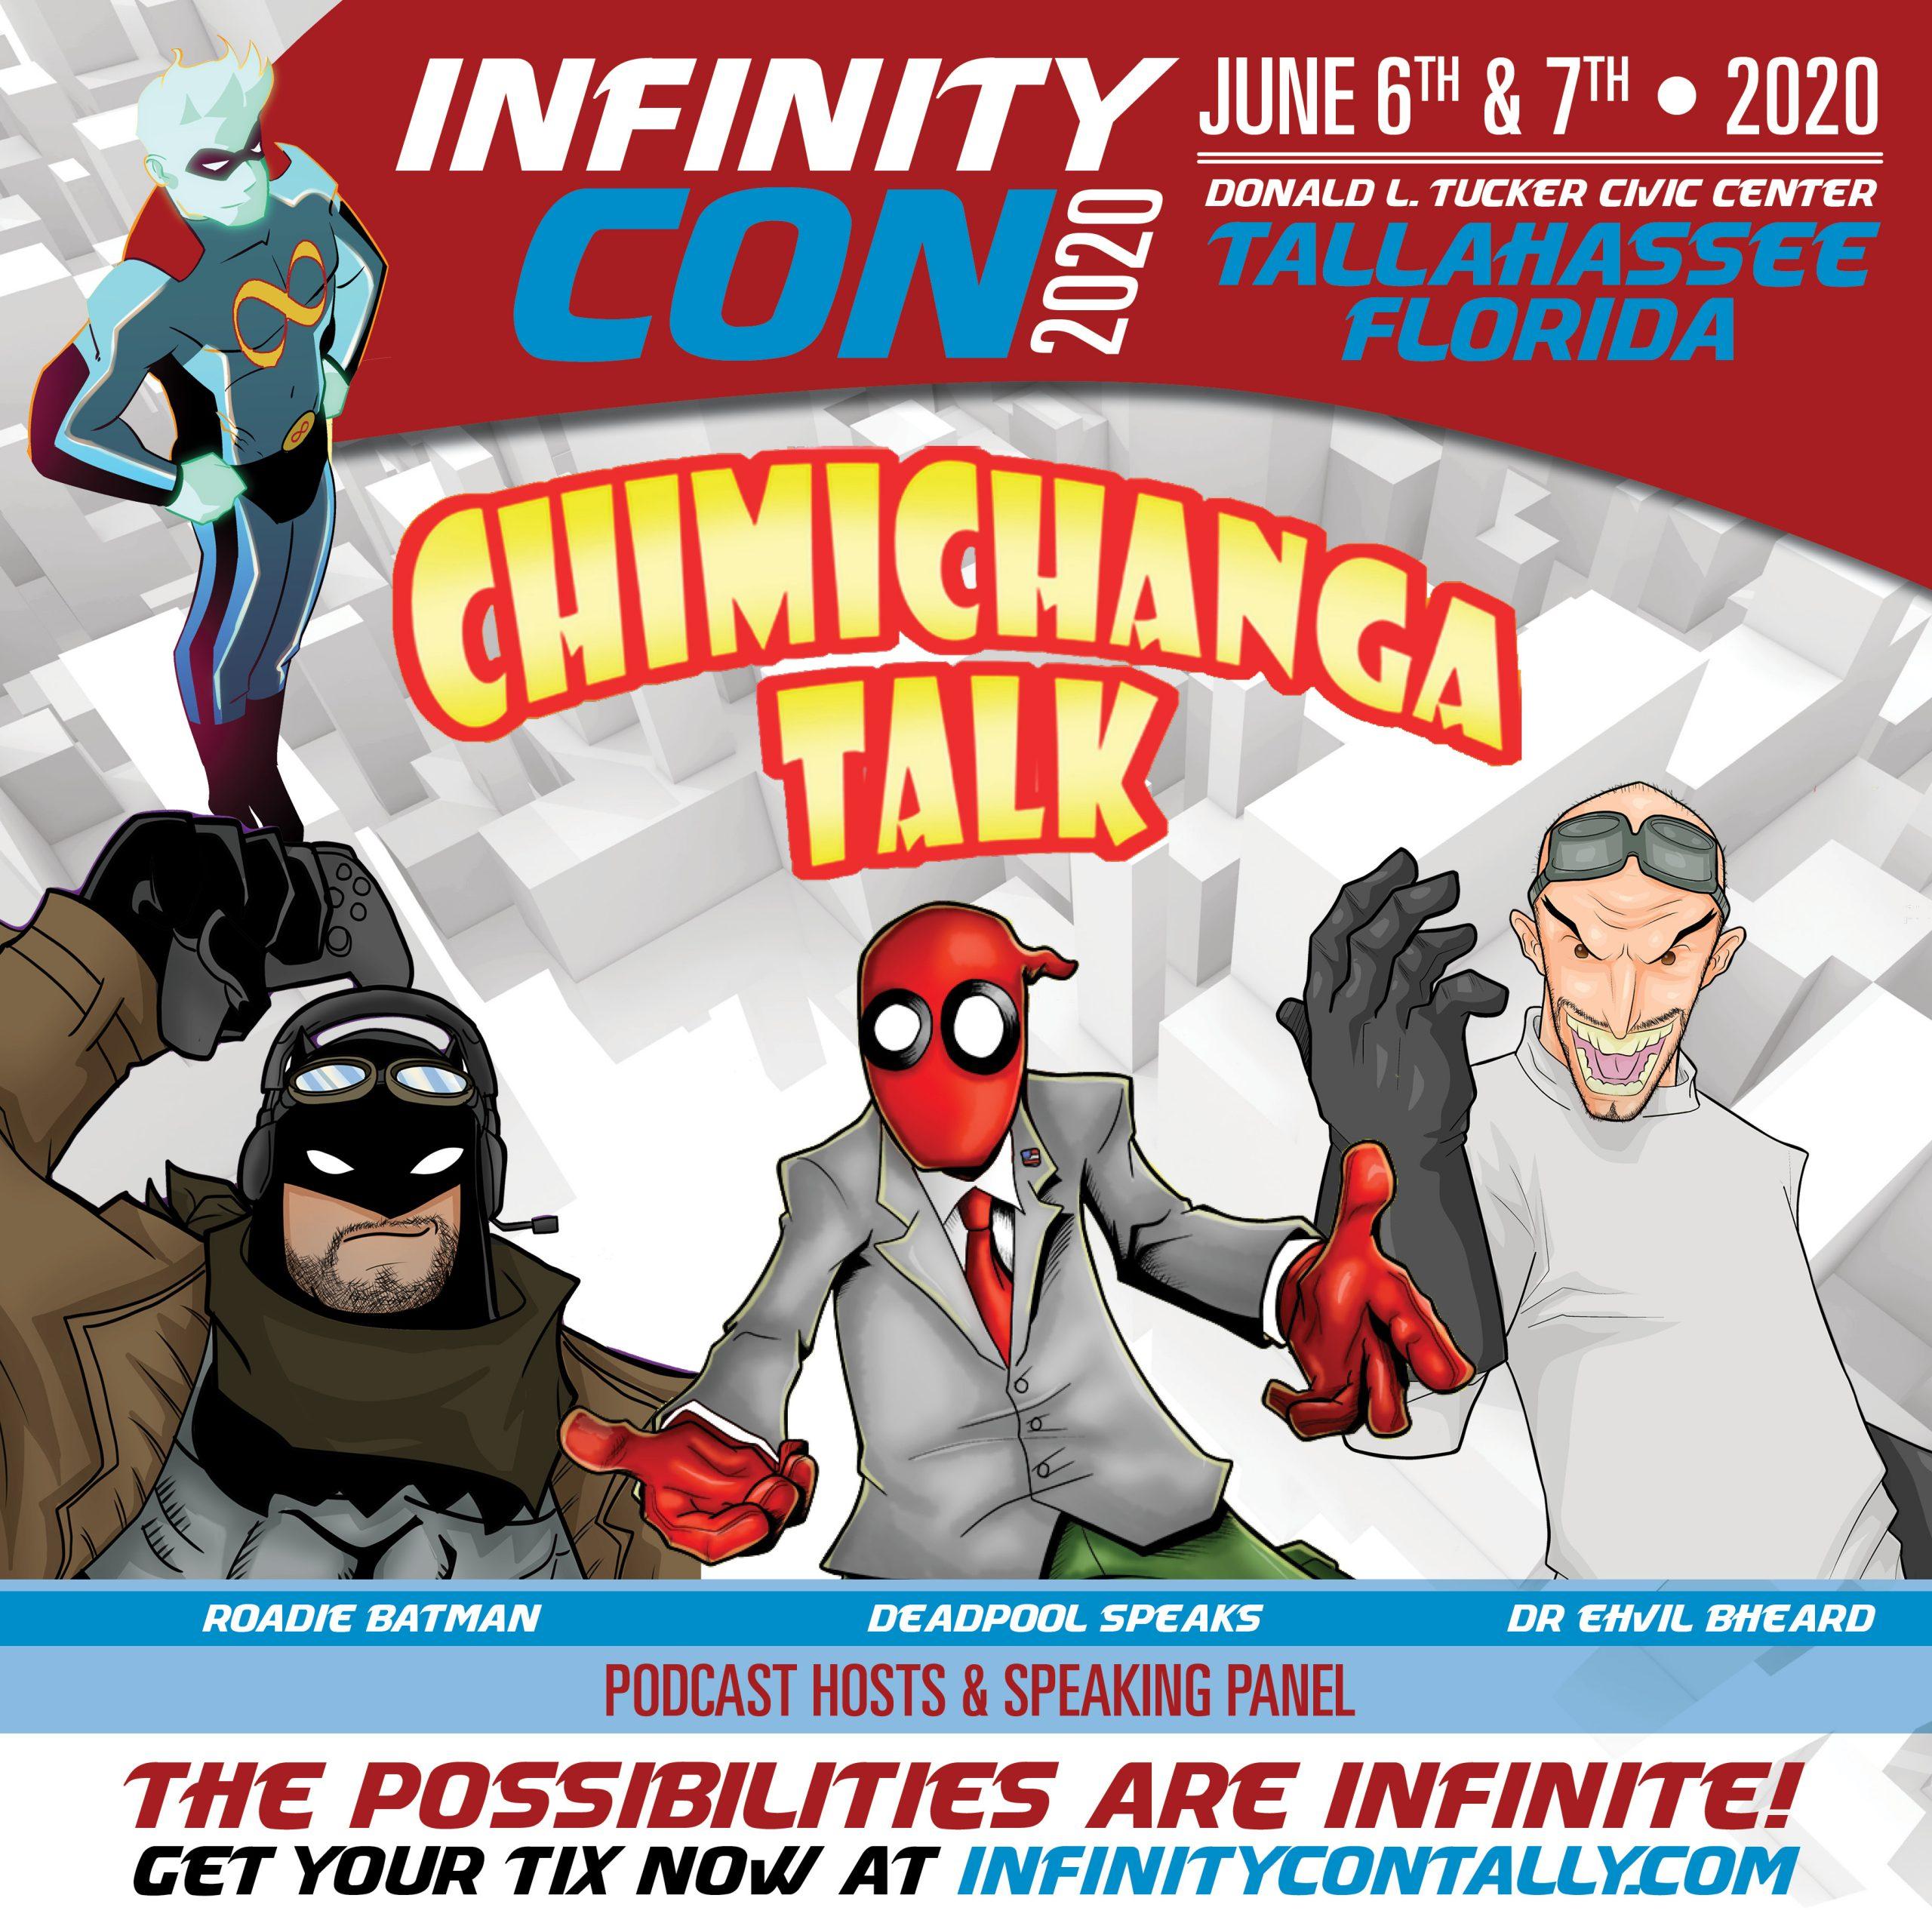 Chimichanga Talk